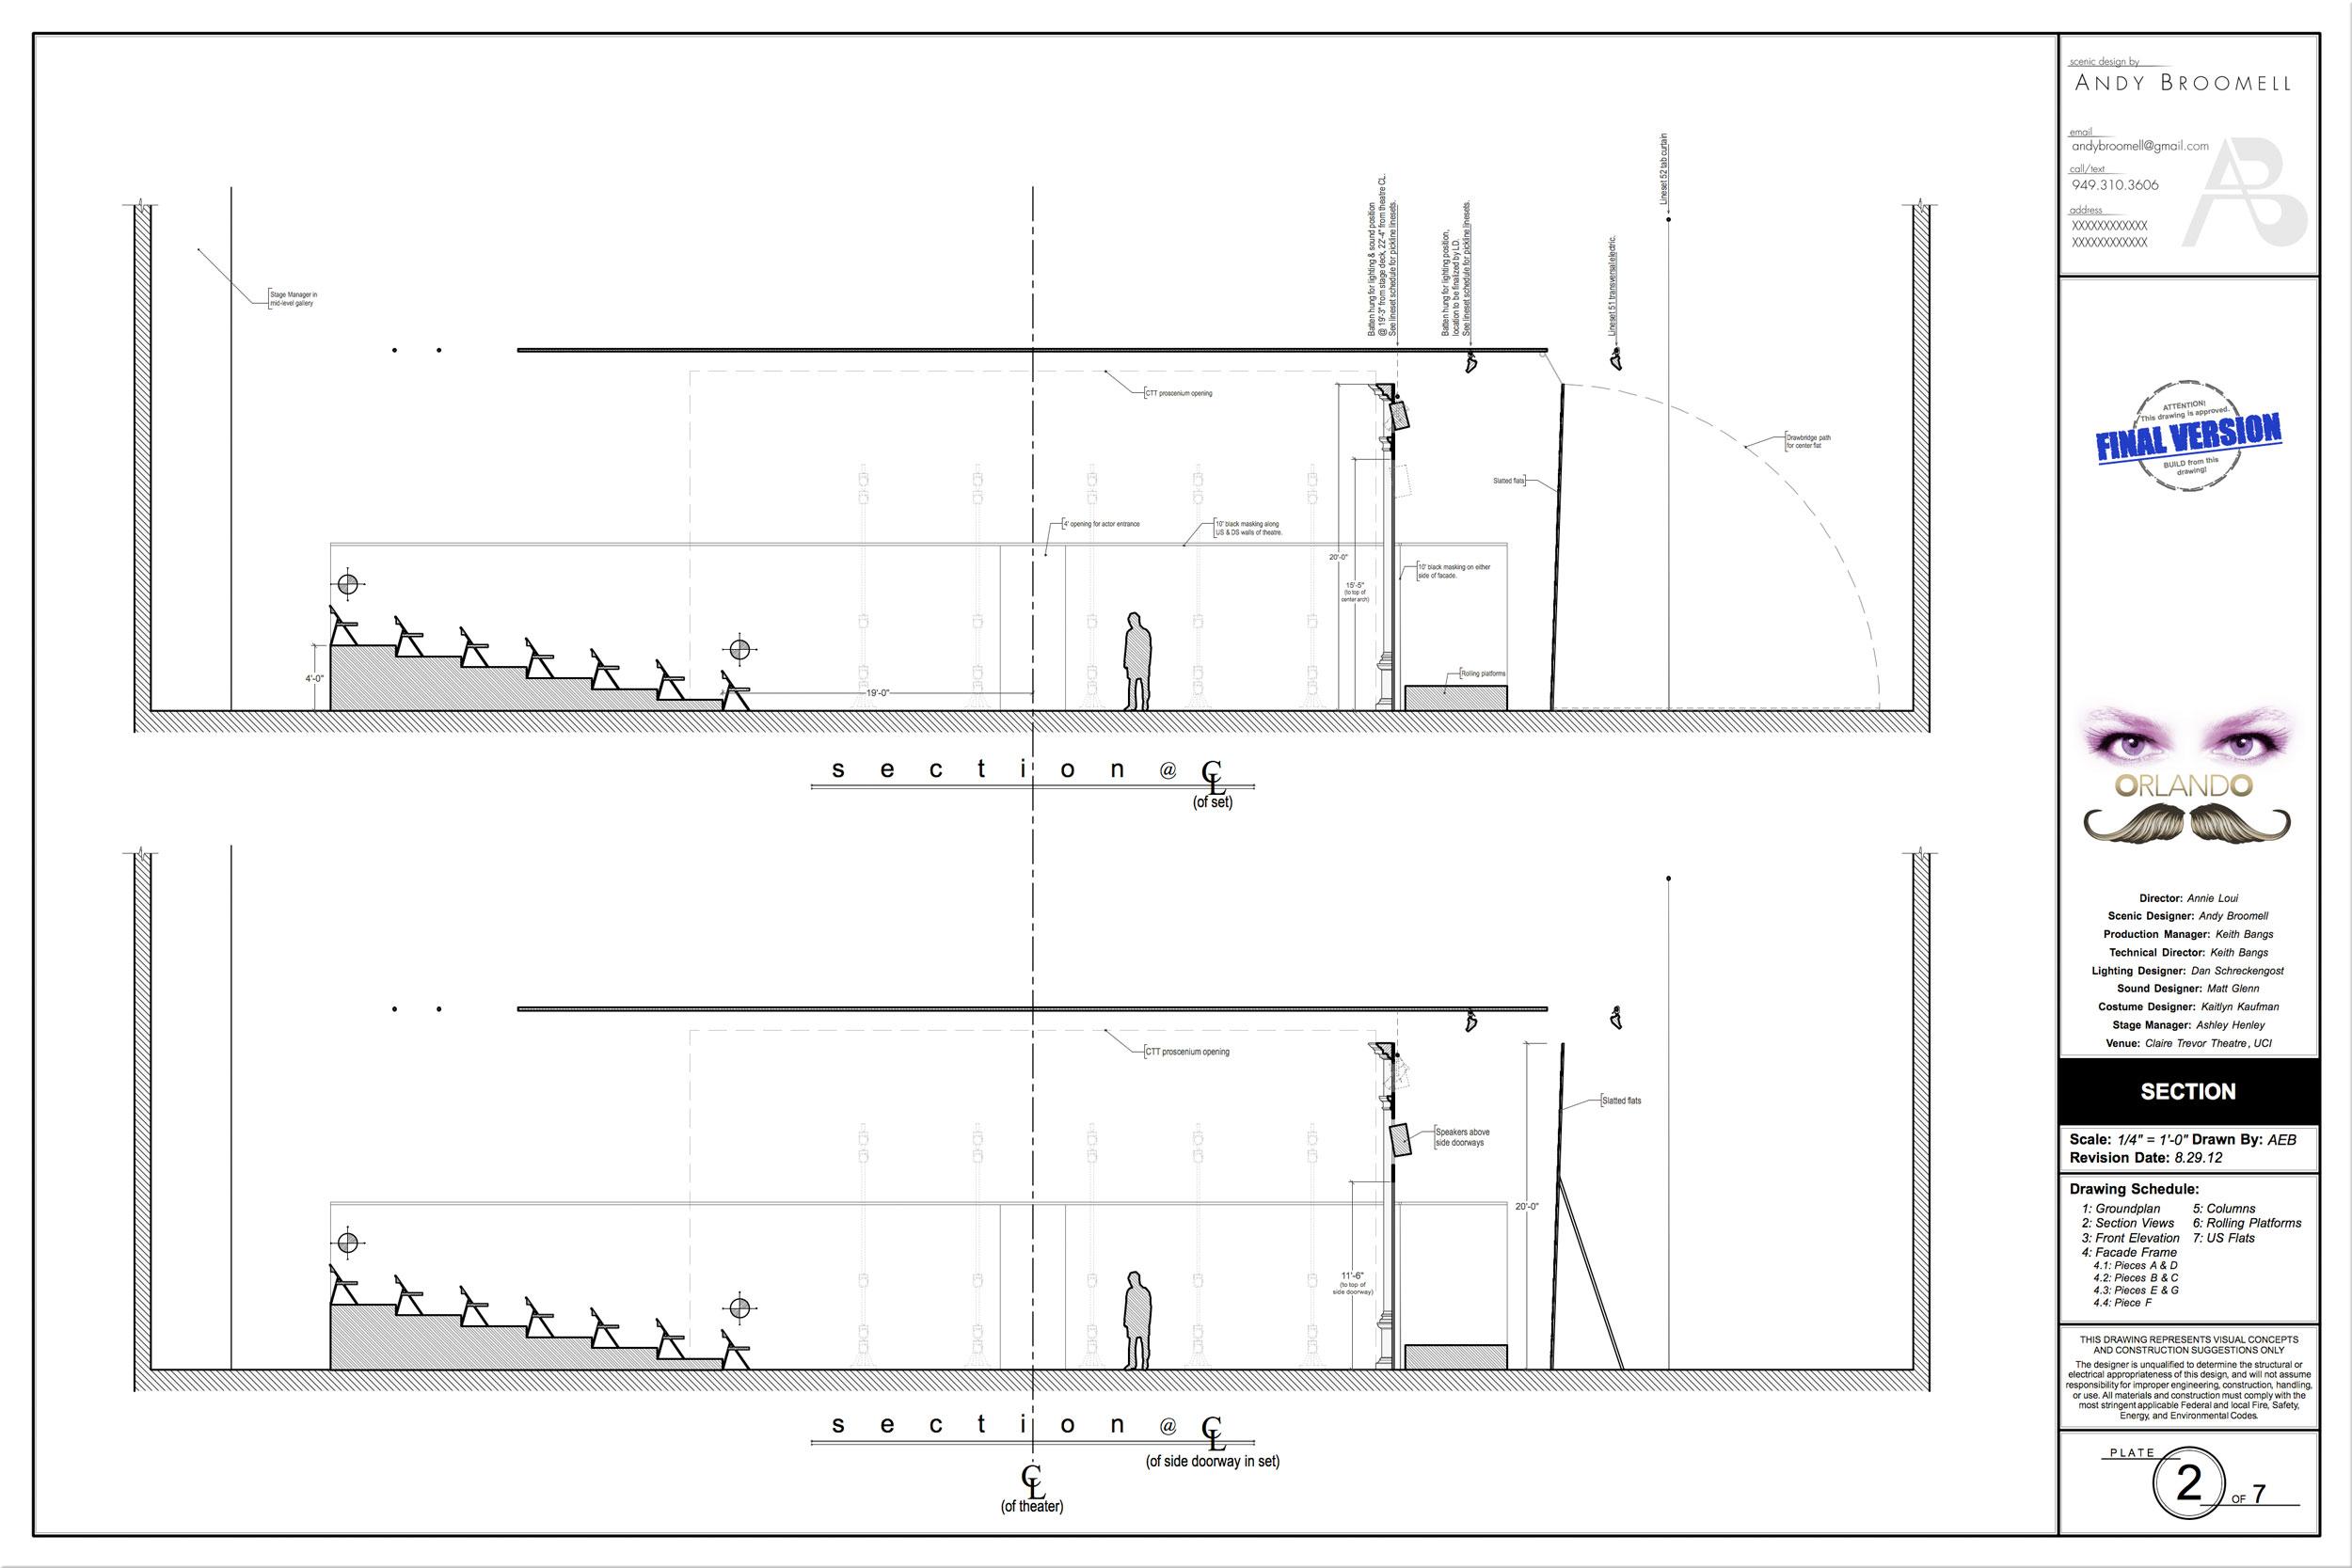 andy-broomell-scenic-design-drafting-orlando-2.jpg